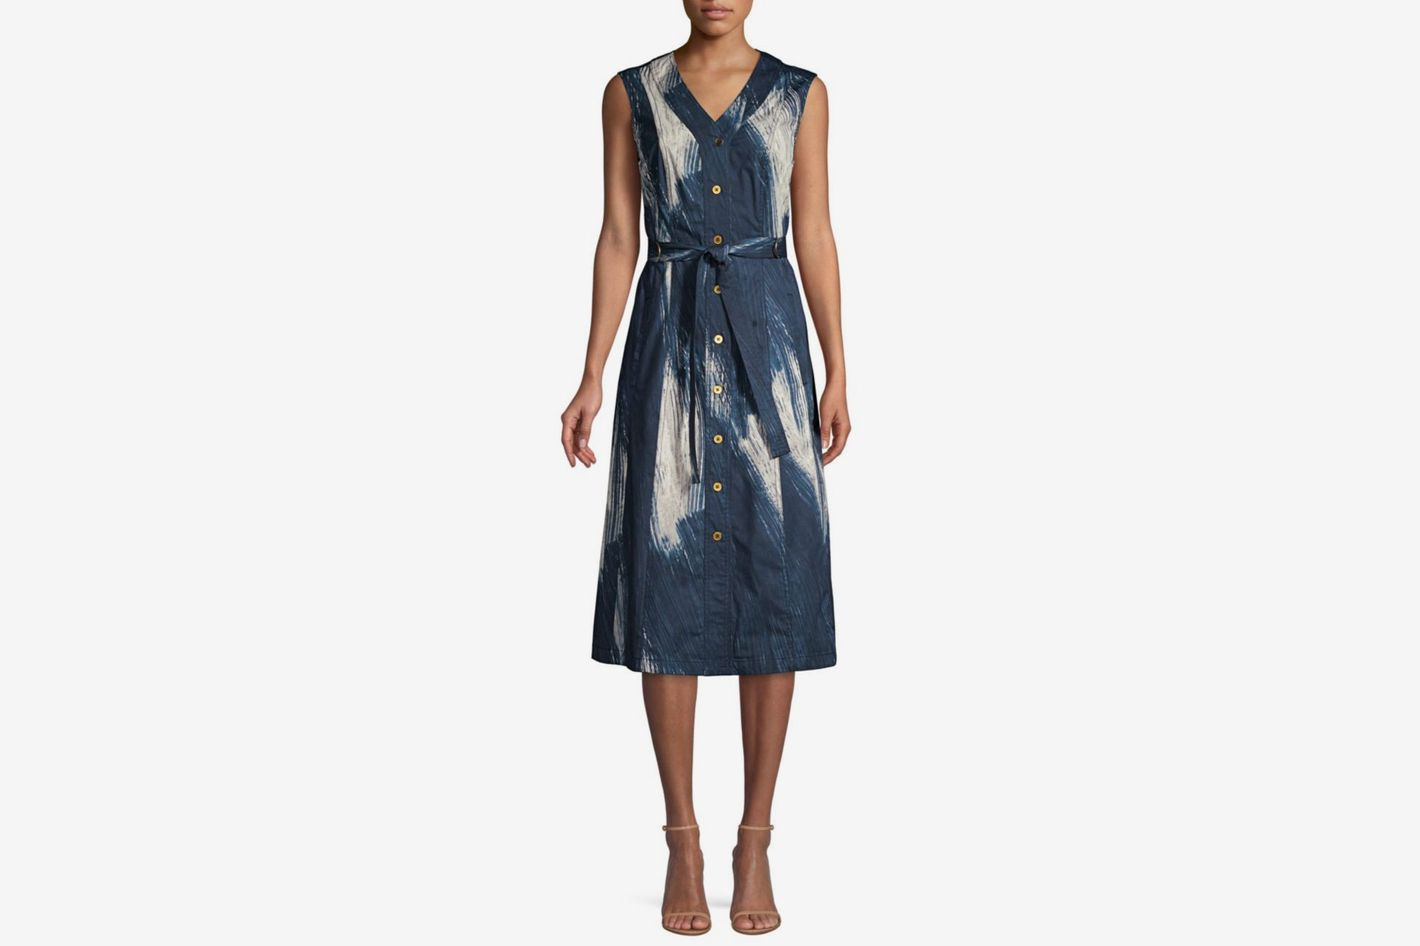 Donna Karan New York Sleeveless Printed Midi Dress